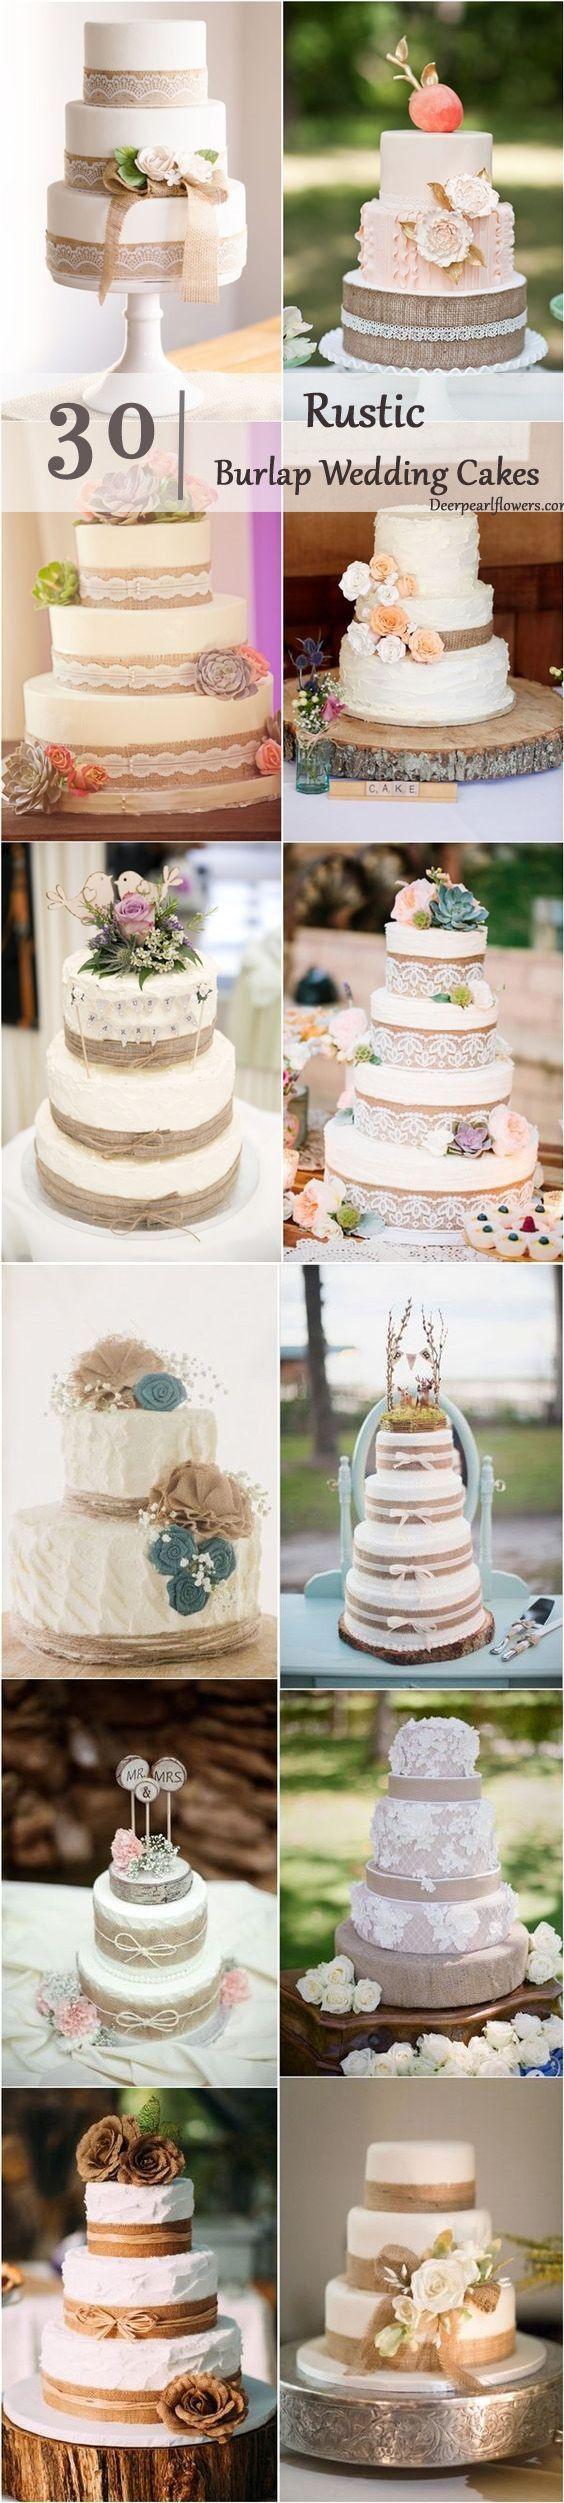 30 Burlap Wedding Cakes for Rustic Country Weddings /  http://www.deerpearlflowers.com/rustic-country-burlap-wedding-cakes/